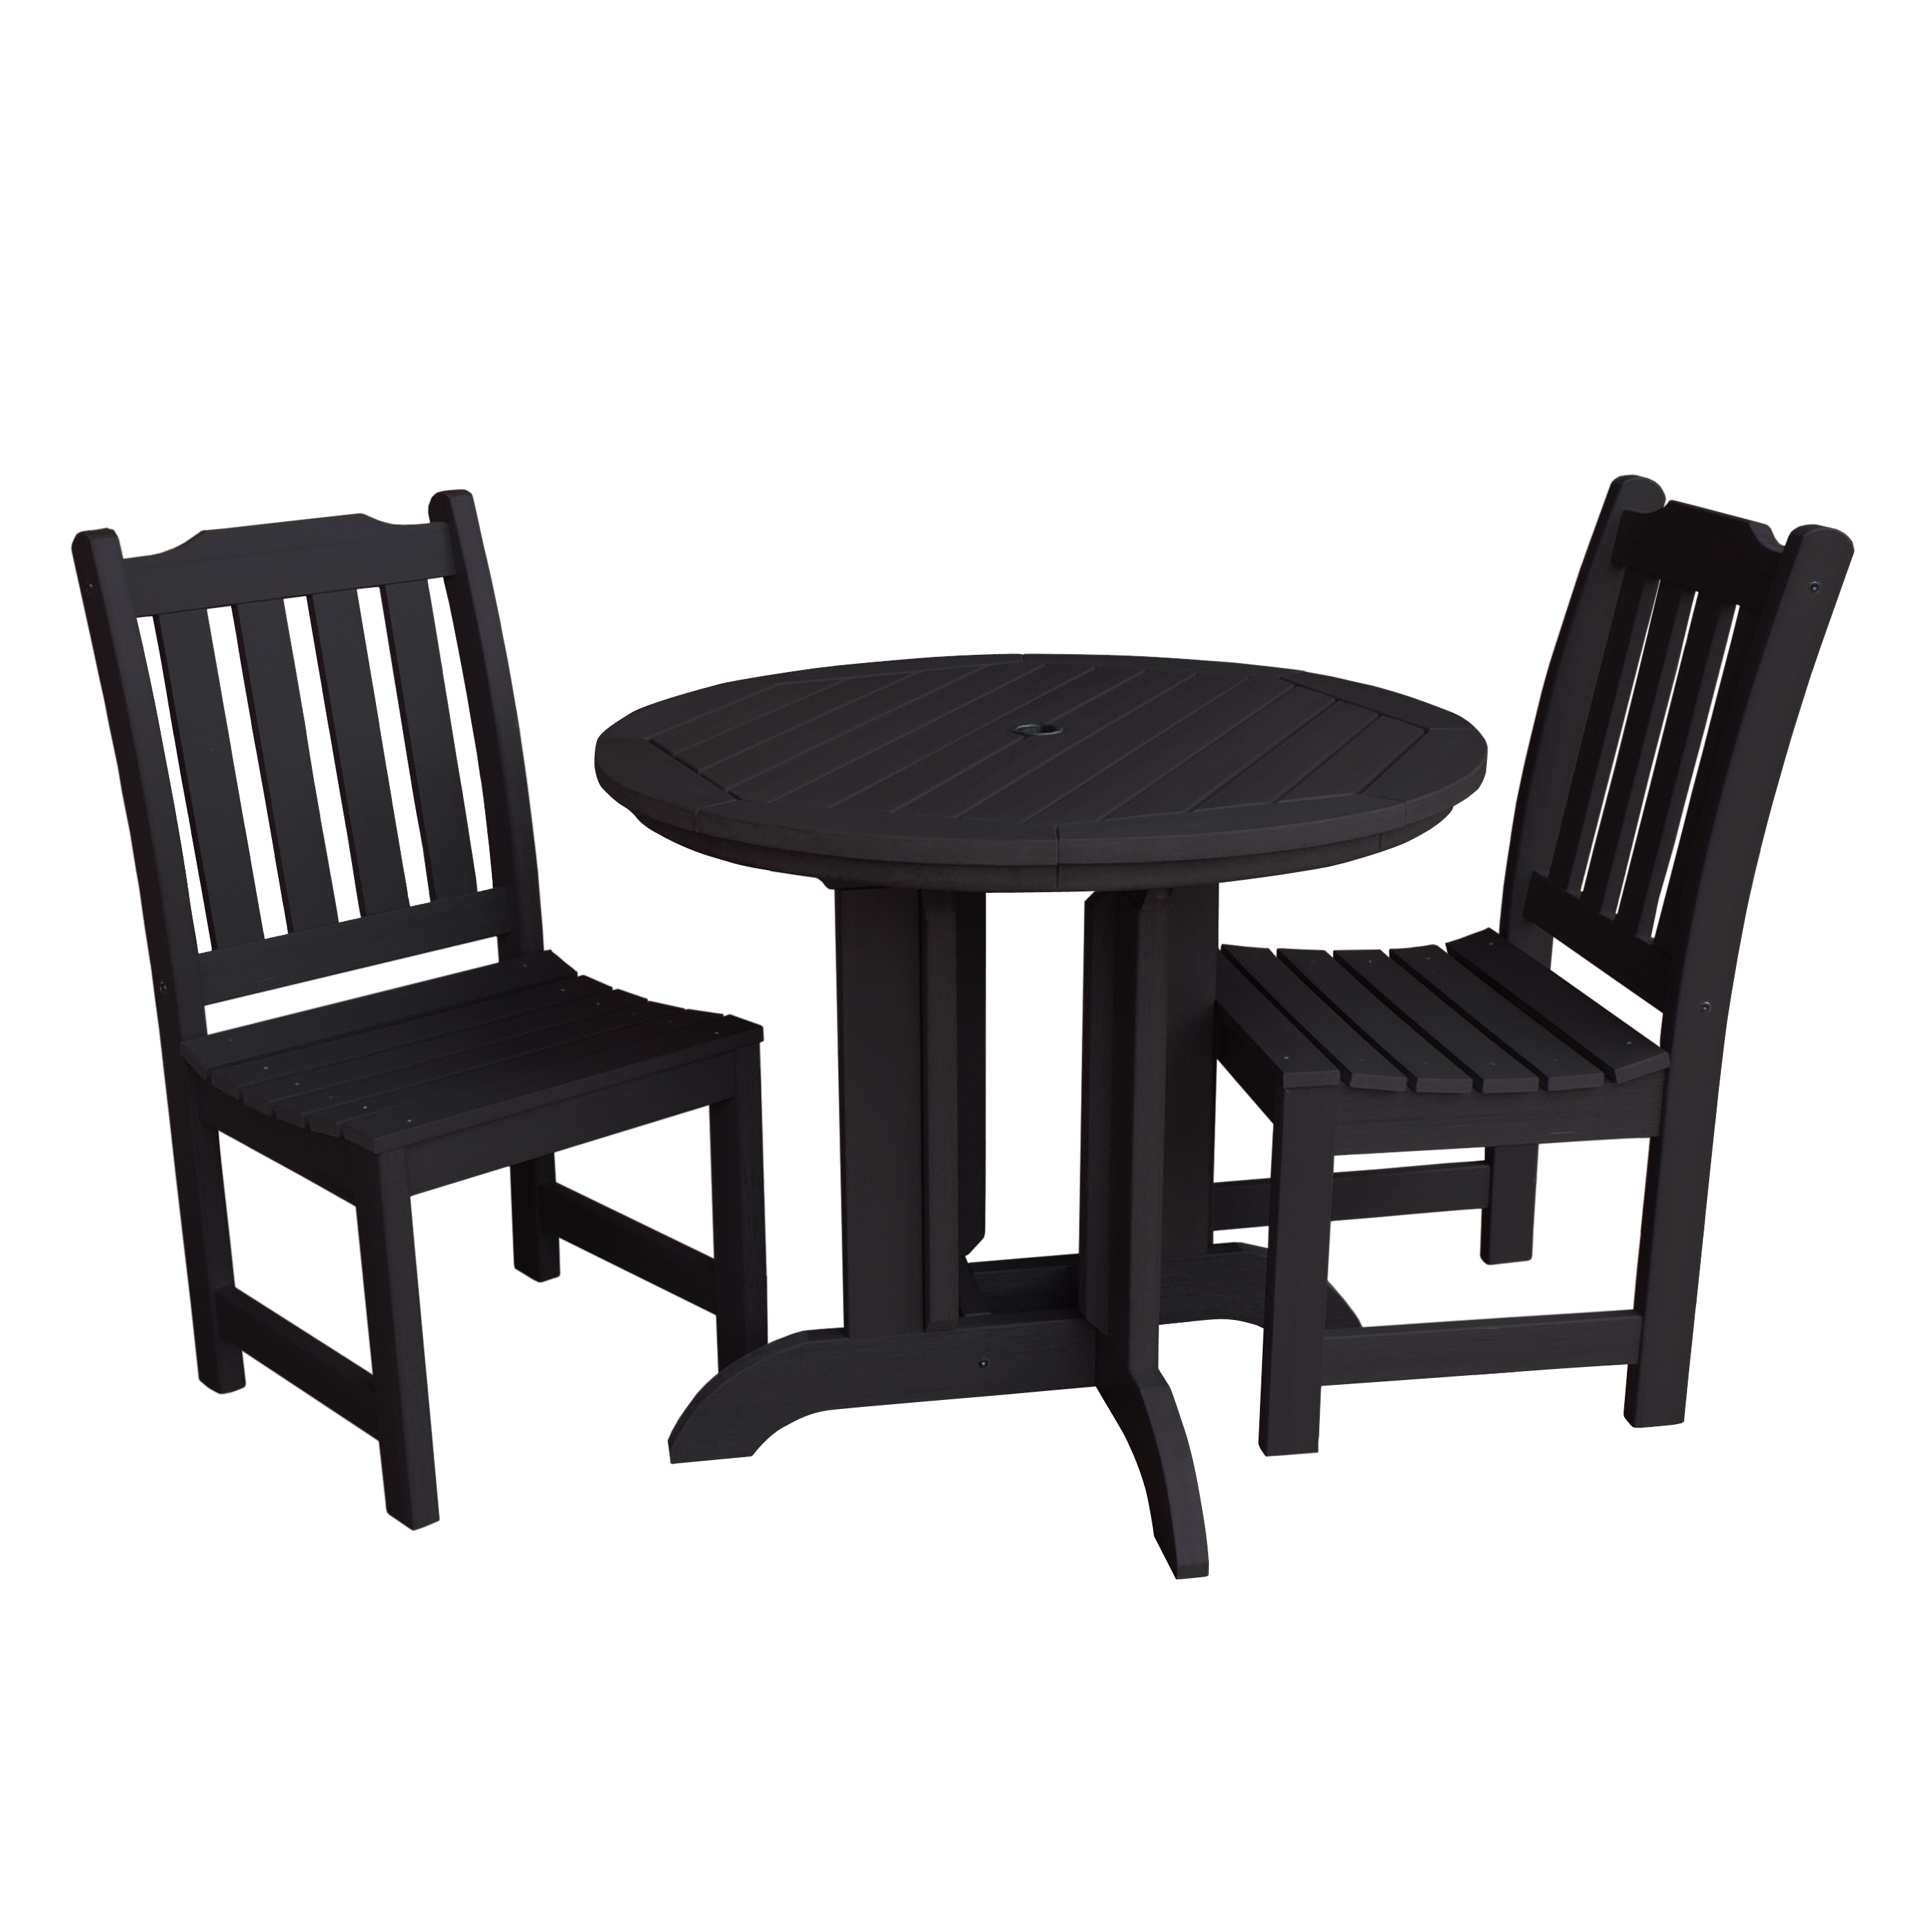 highwood® Eco-Friendly Recycled Plastic Lehigh 3pc Round Dining Set